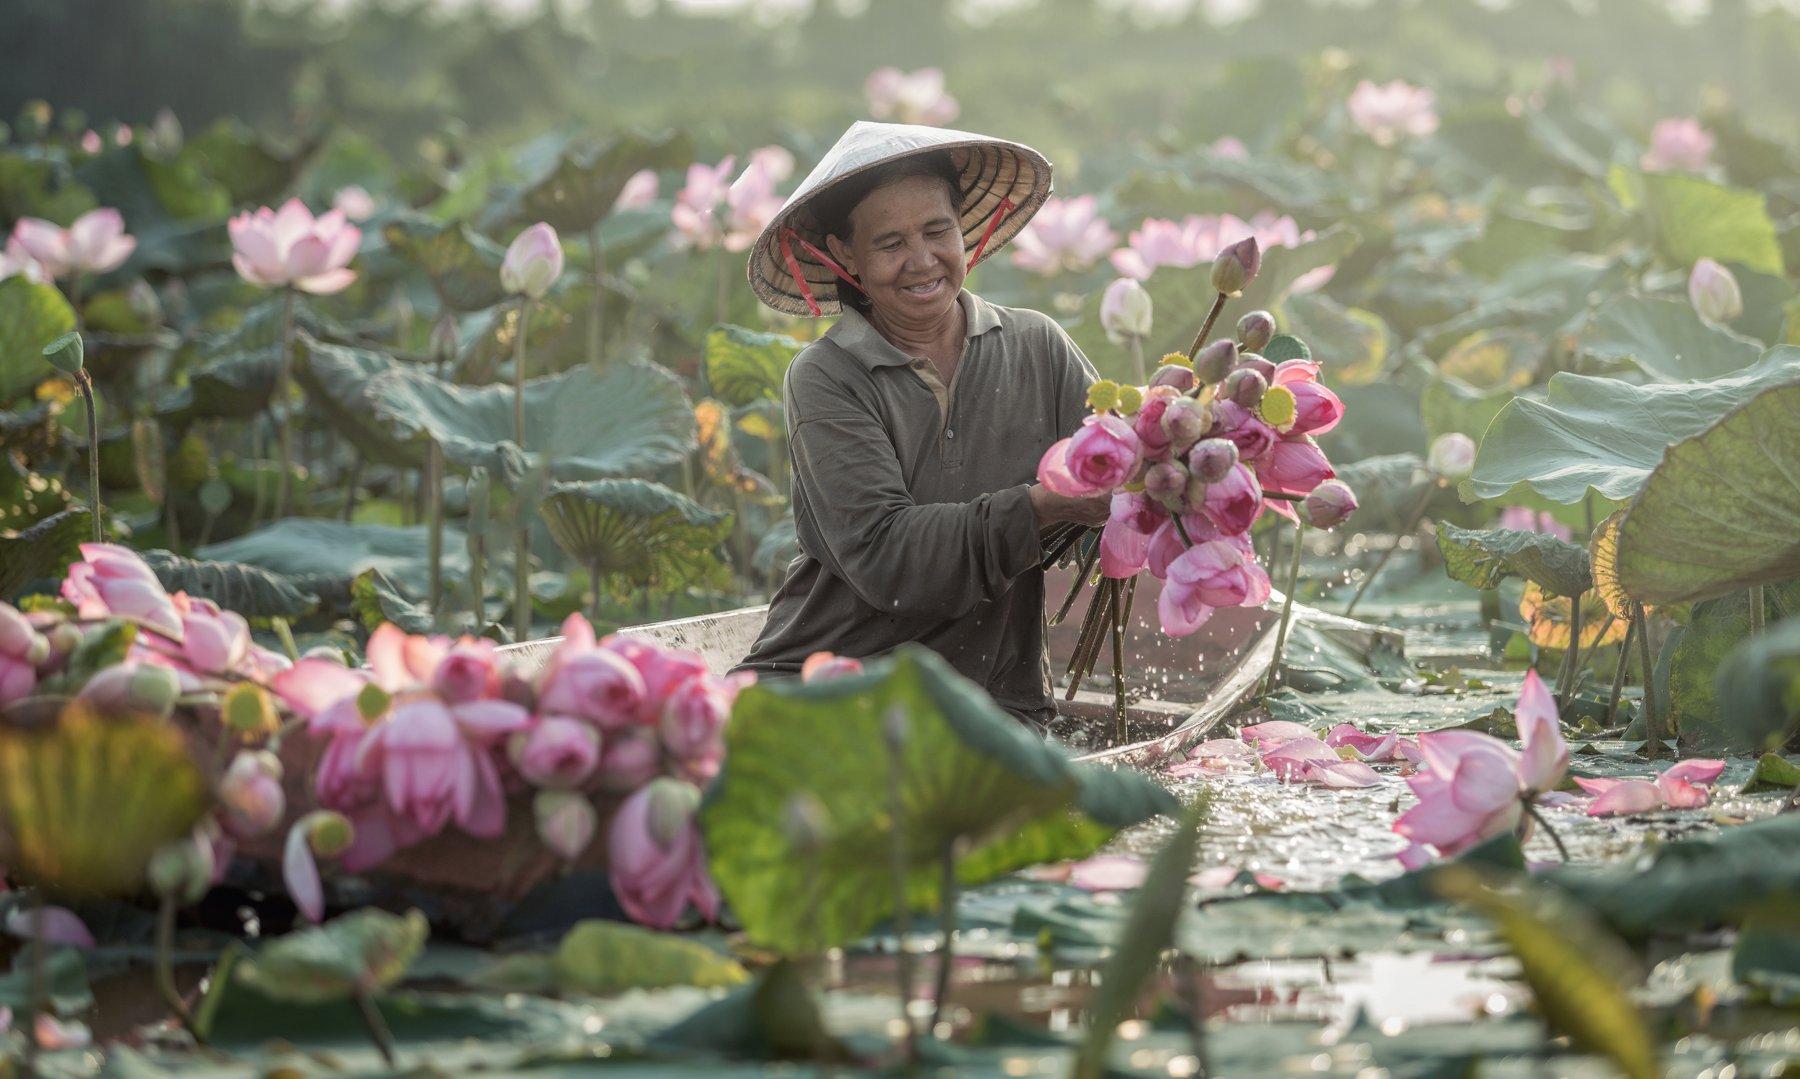 life,thaipeople,women,boat,lotus,flower,pink,morning,plant,lake,asia,, SUTIPORN SOMNAM